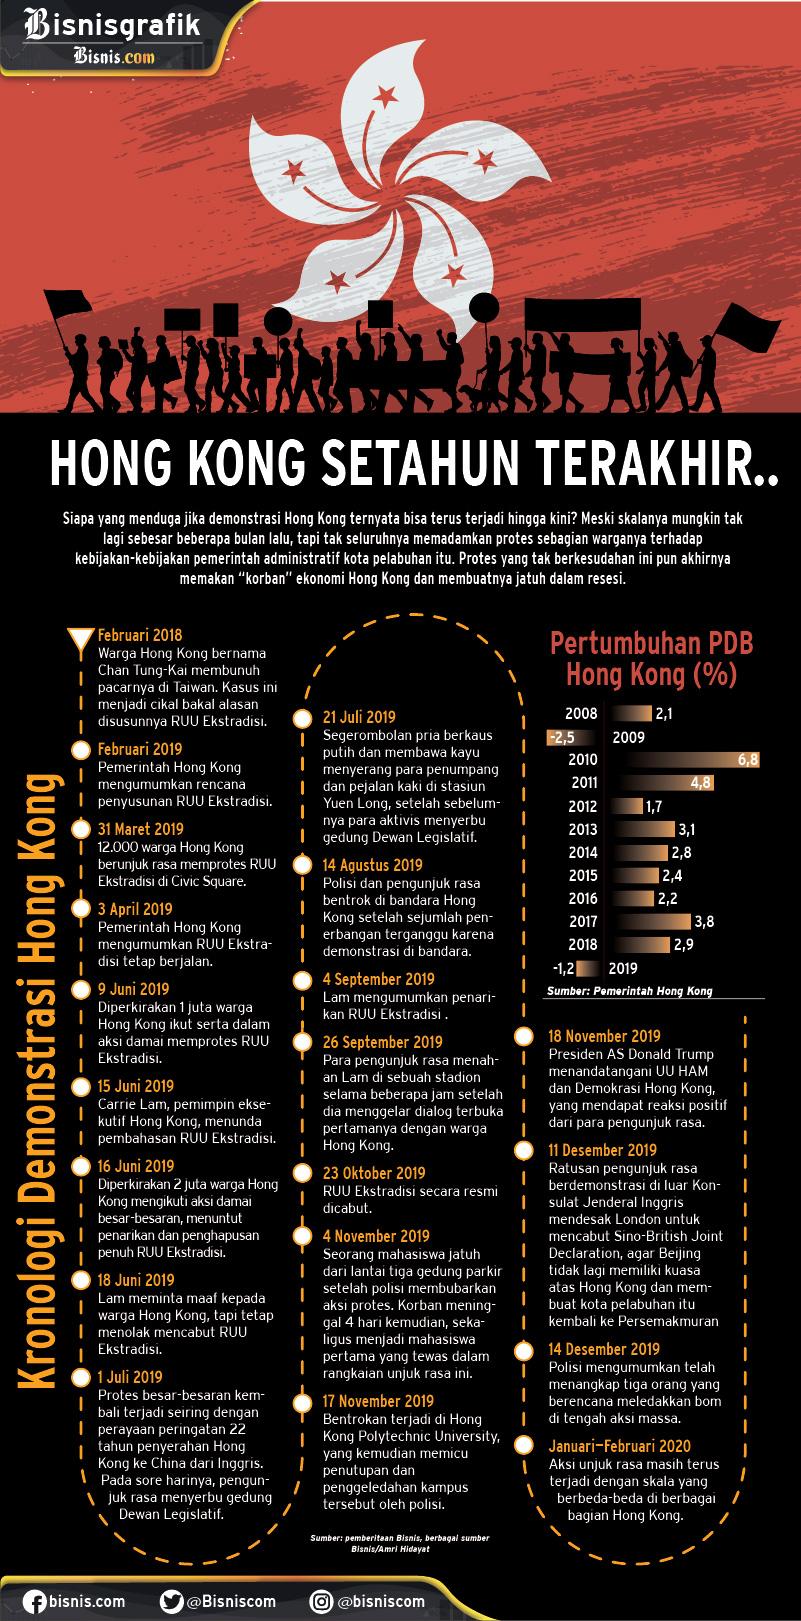 Infografik kronologi demonstrasi Hongkong. - Bisnis/Amri Hidayat